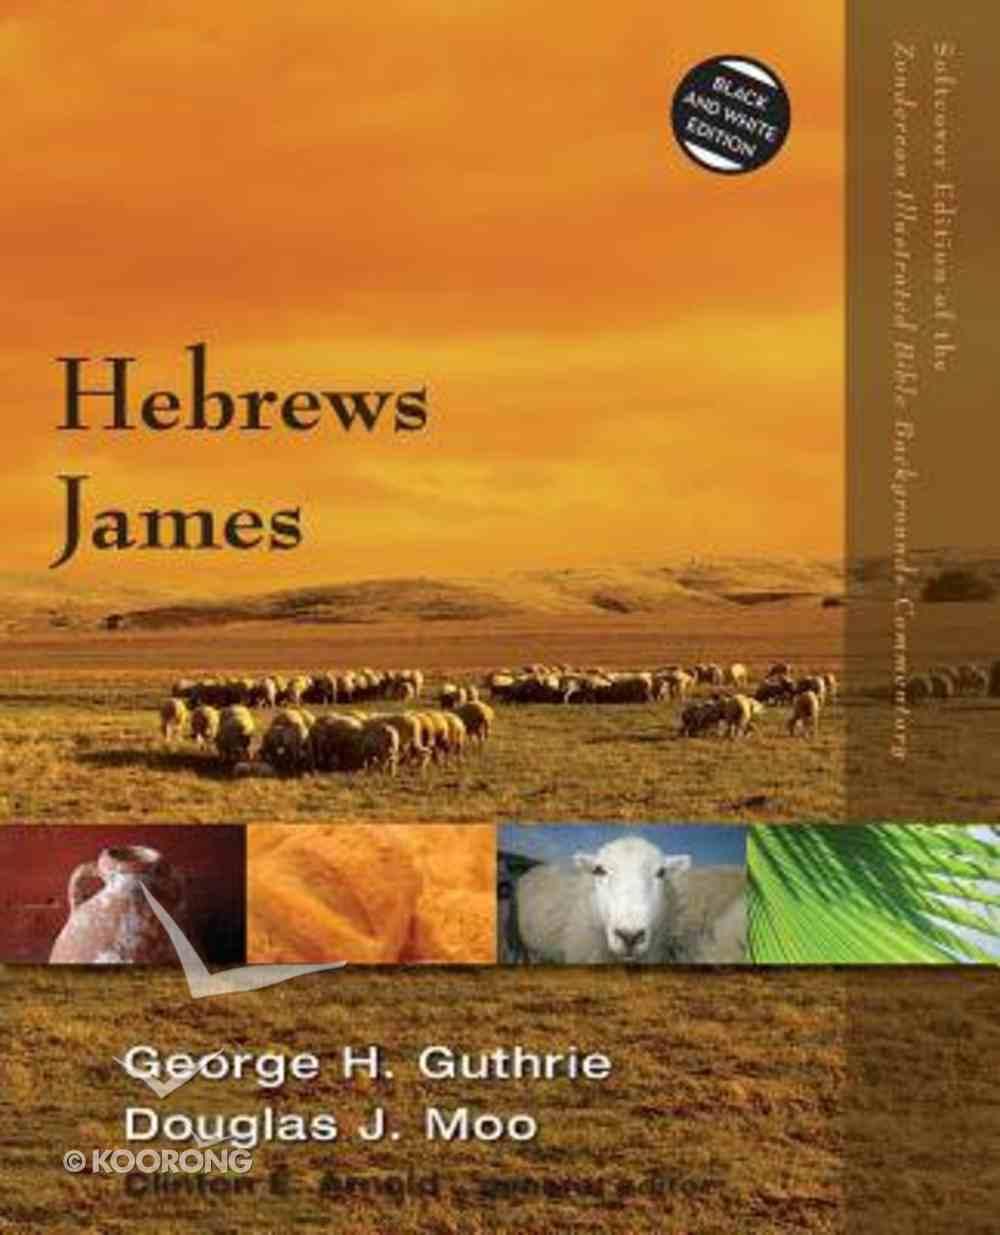 Hebrews, James (Zondervan Illustrated Bible Backgrounds Commentary Series) Paperback